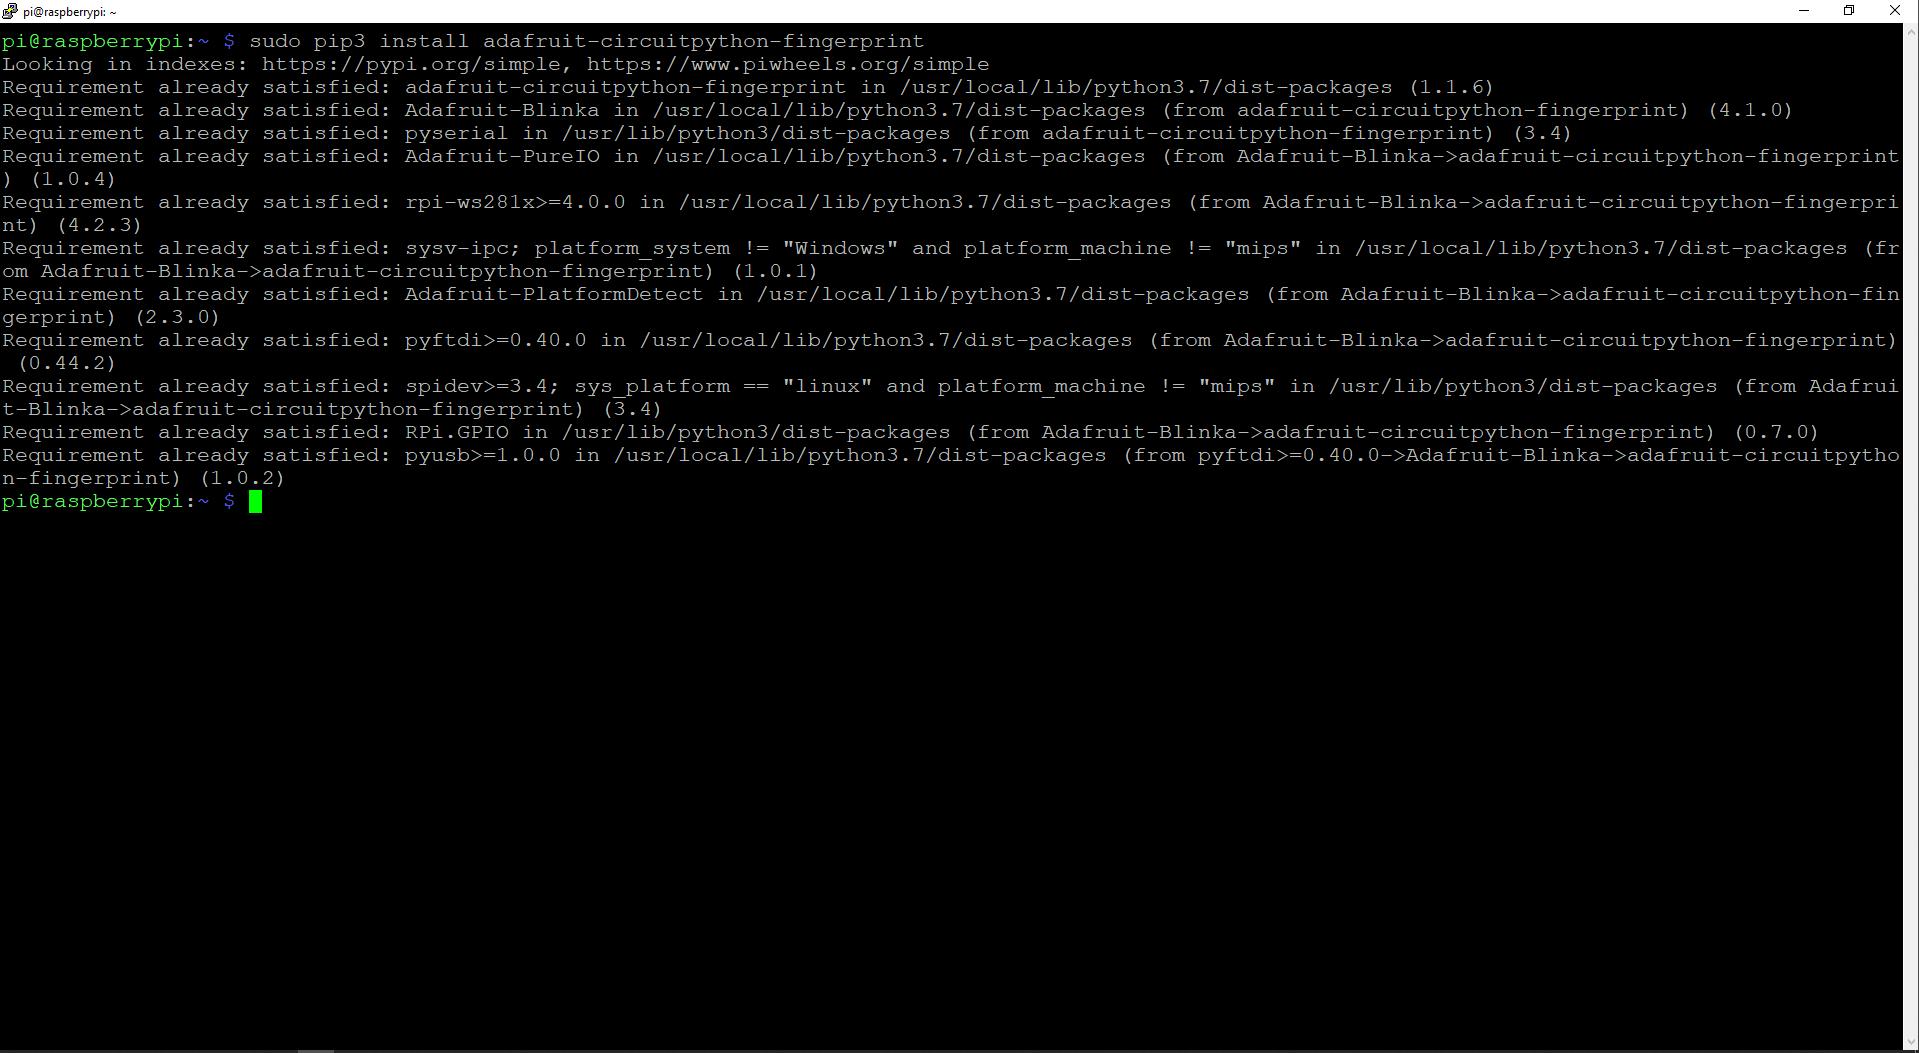 Raspberry_Pi_Fingerprint_Scanner_RW_MP_image2.png